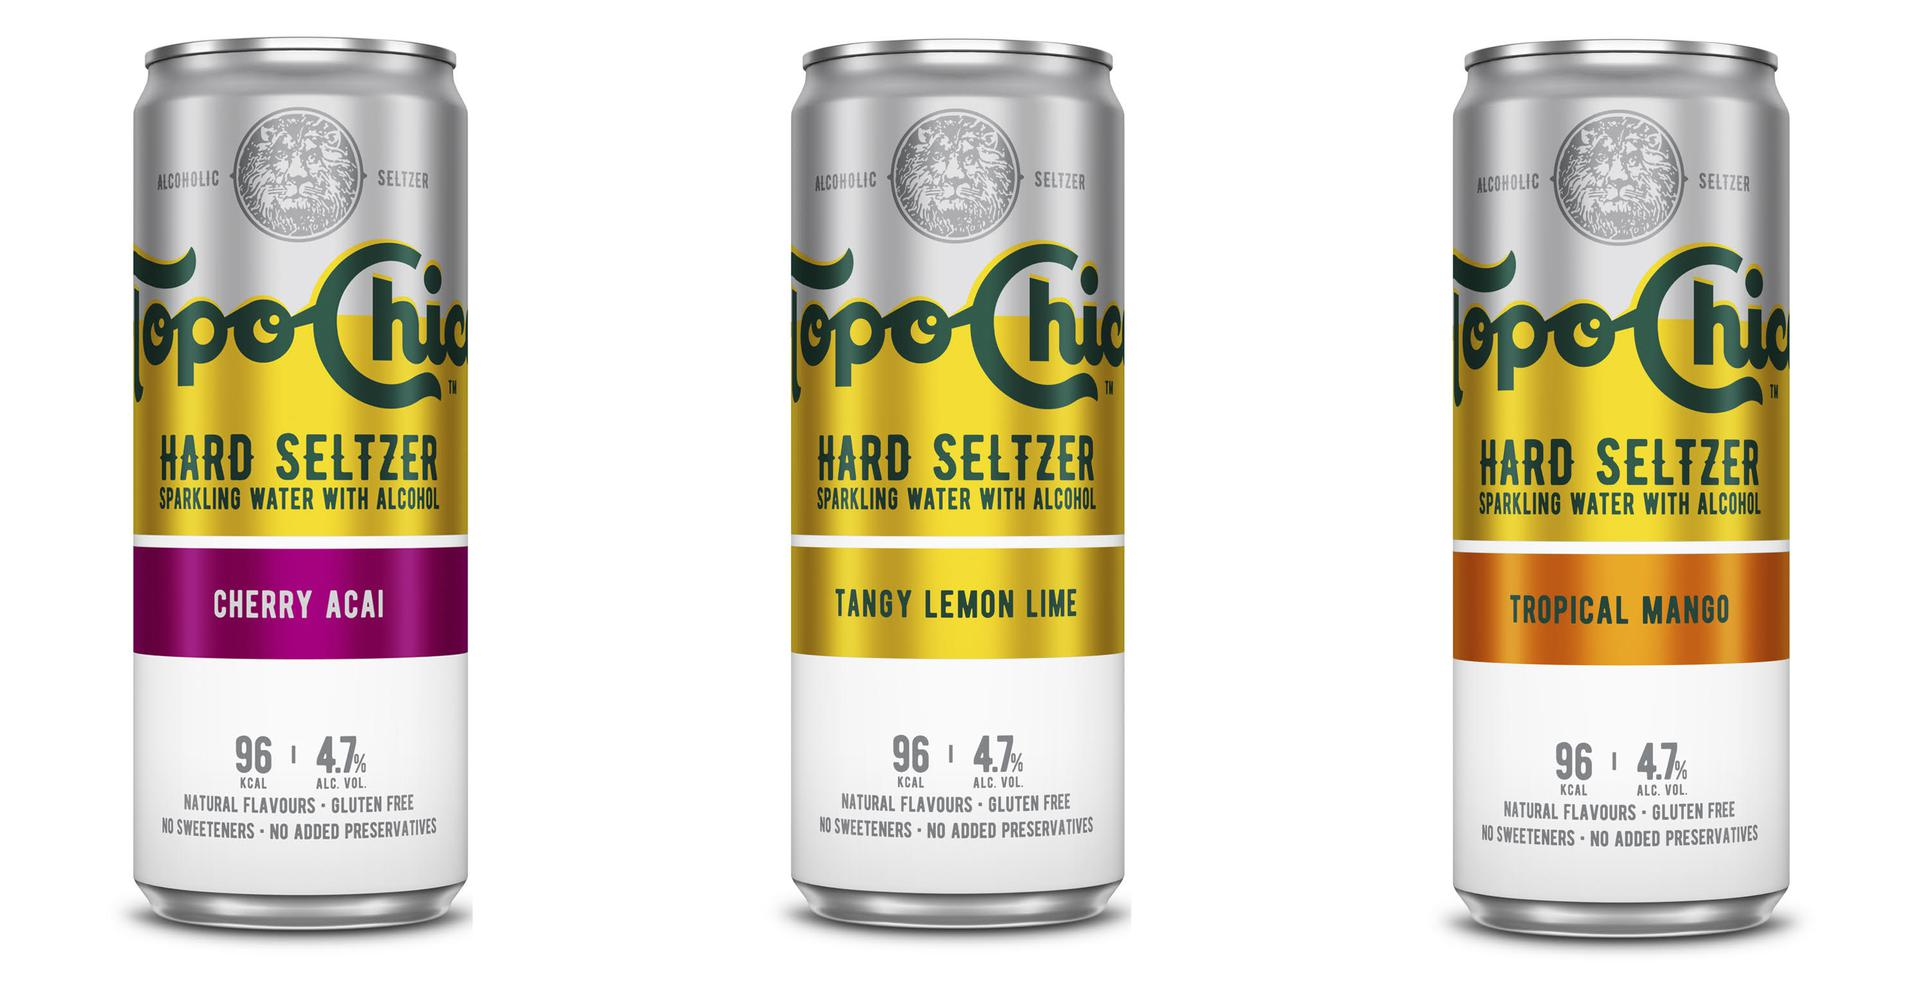 top chico Hard Seltzer, alcohol, alcoholische drank, nederland, frisdrank